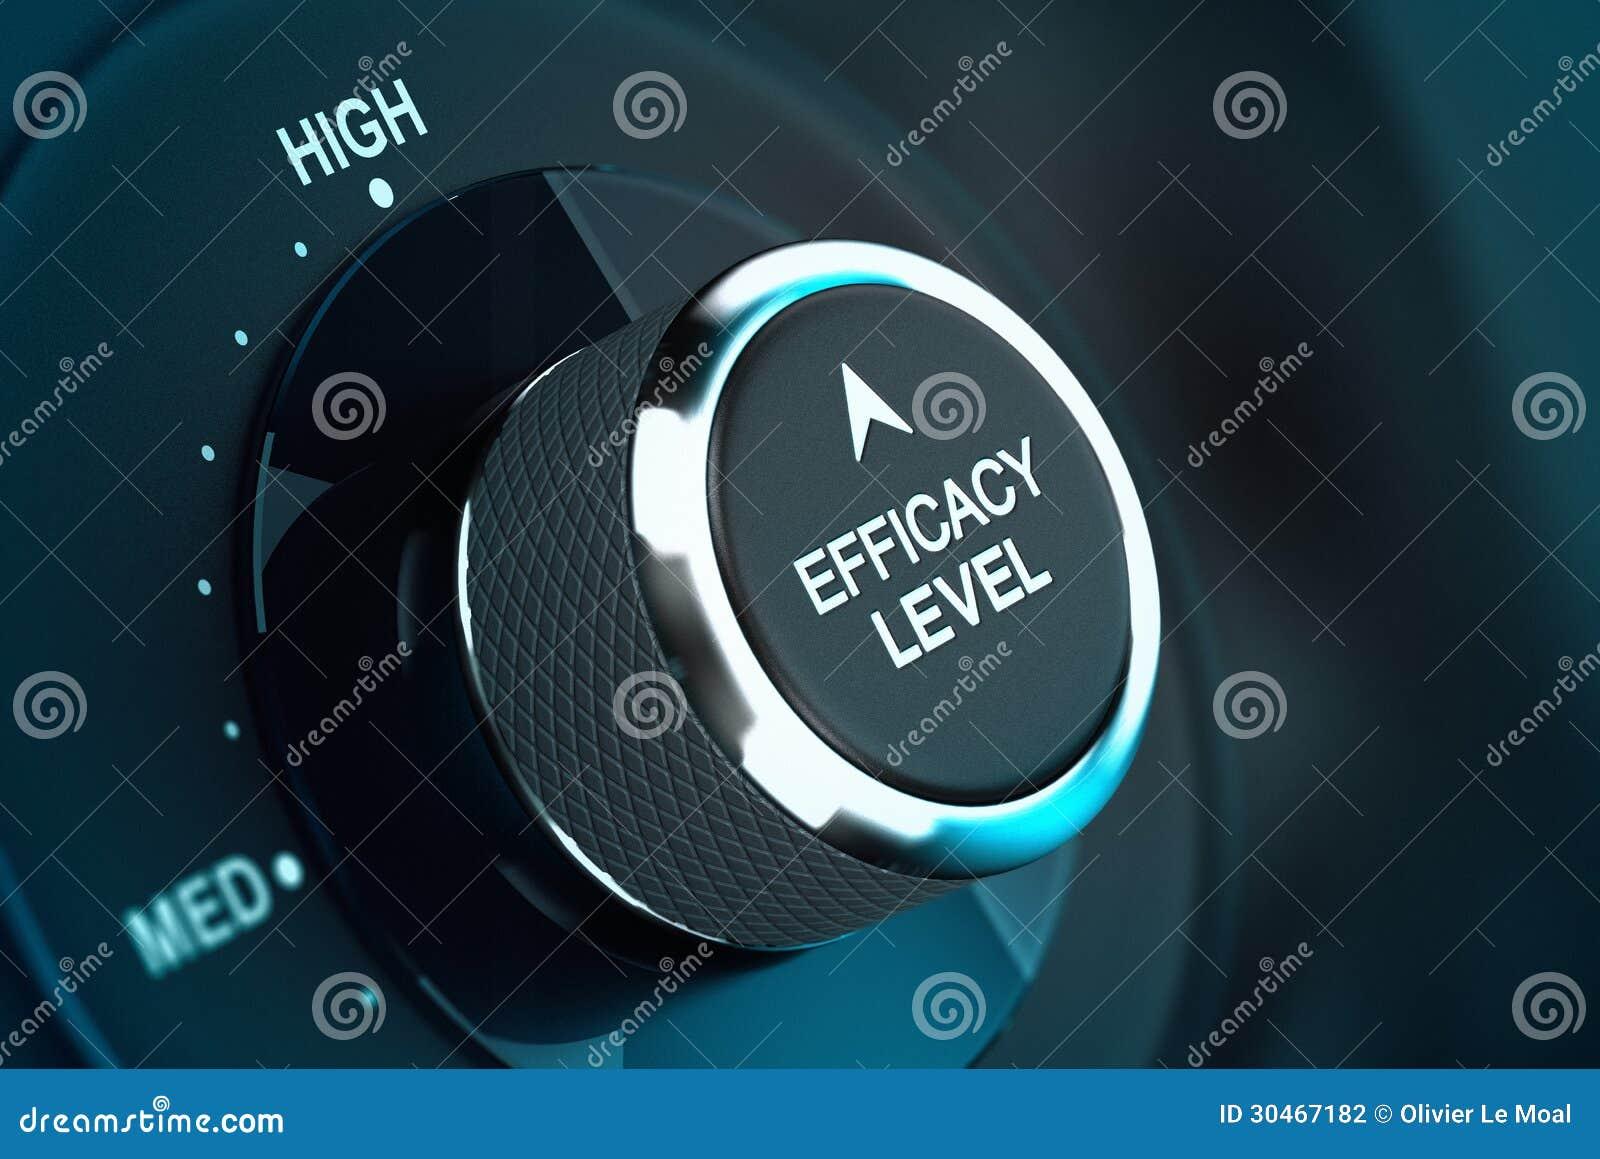 Hoog Zelfdoeltreffendheidsniveau - Efficiencydoelstelling